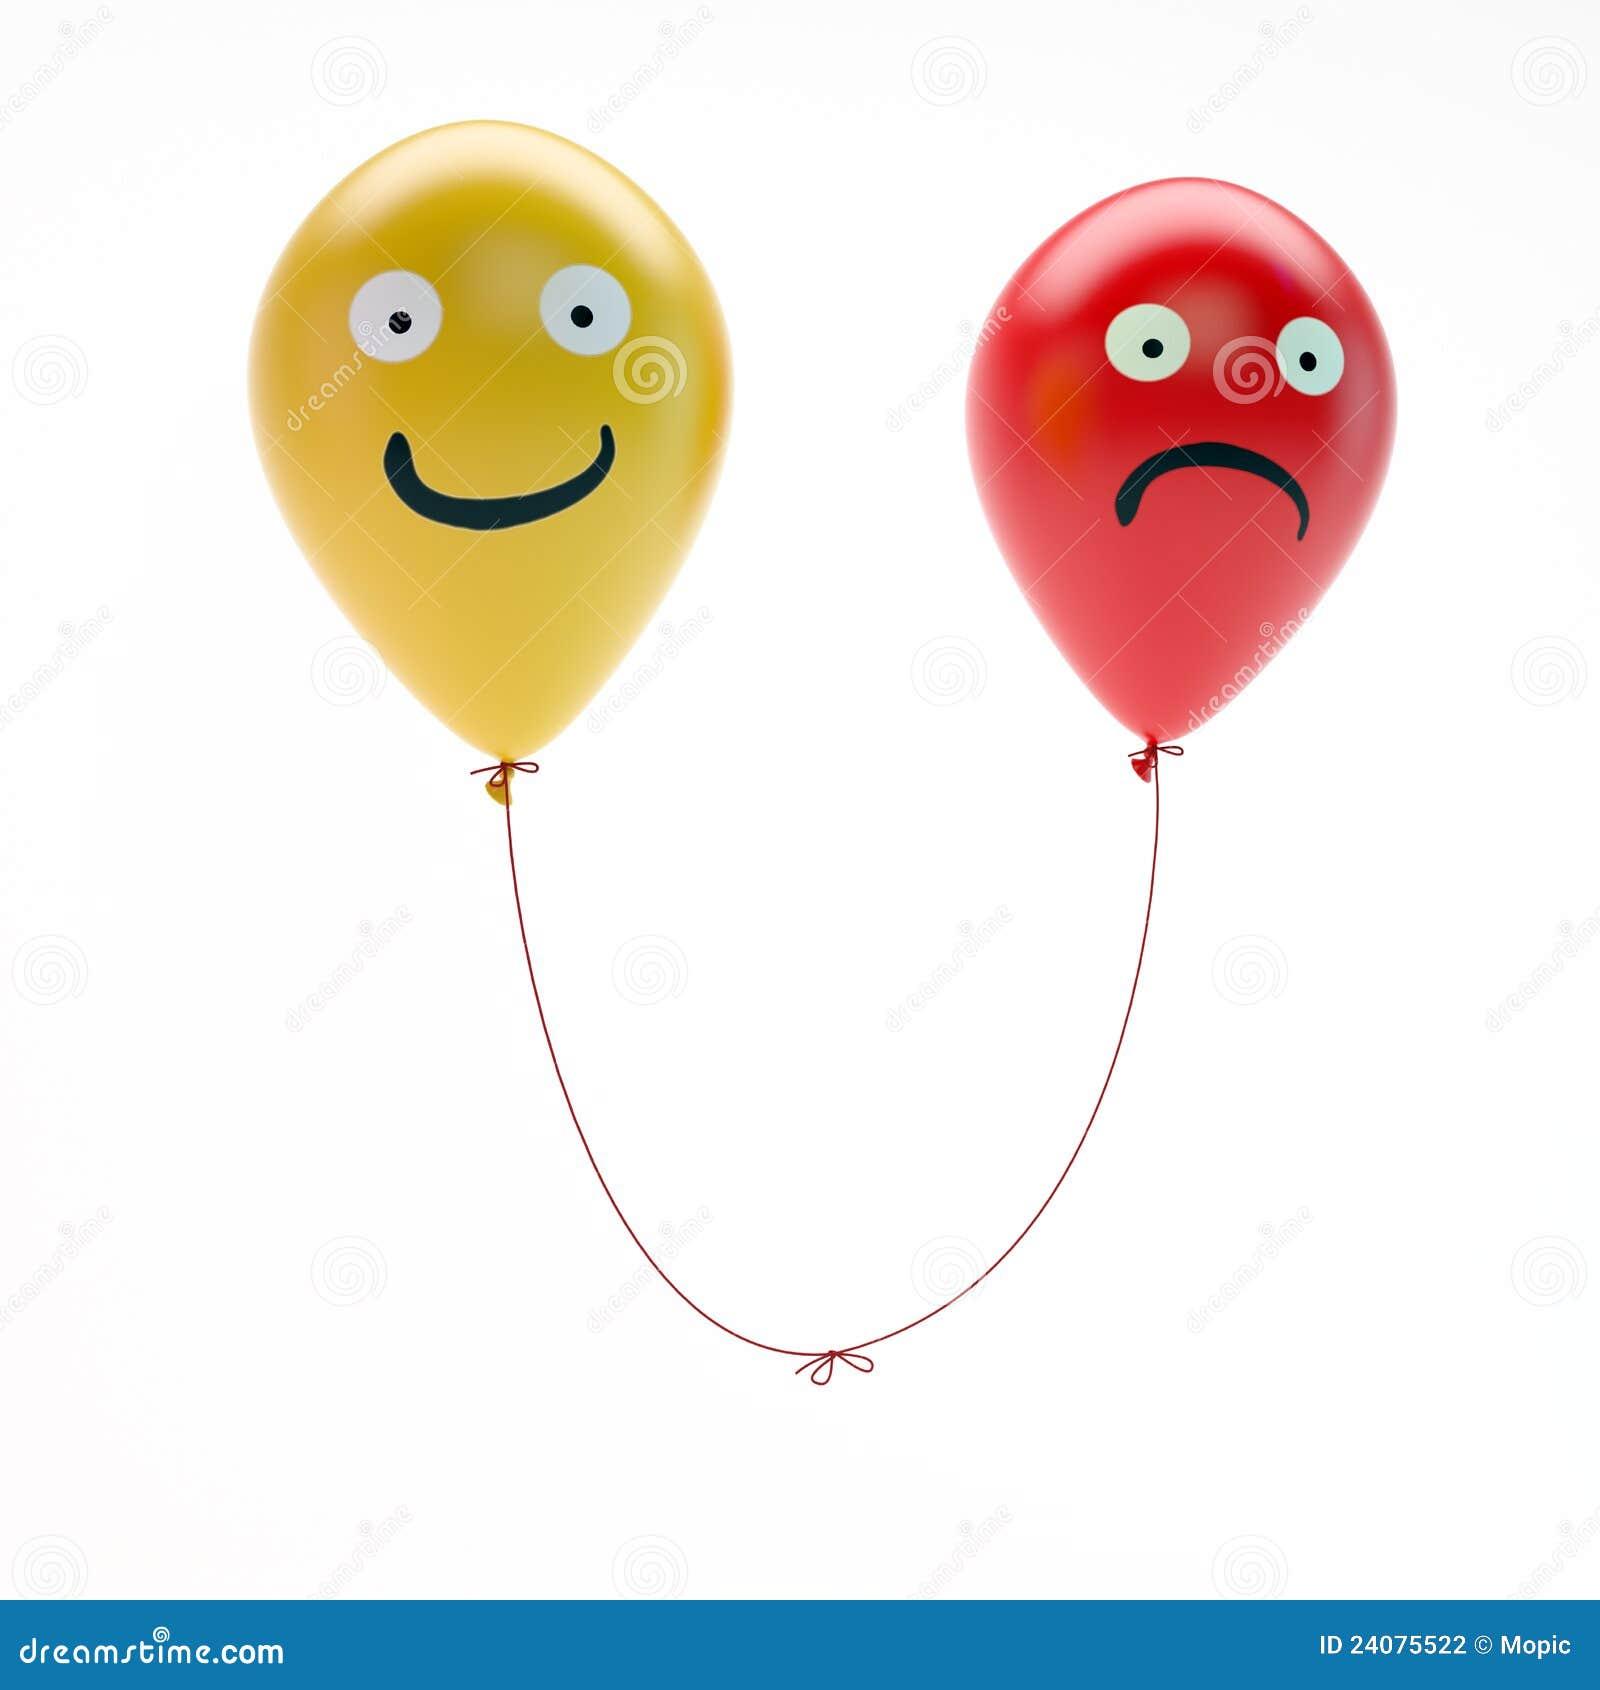 Sad Happy Balloons on Unhappy Man Cartoon